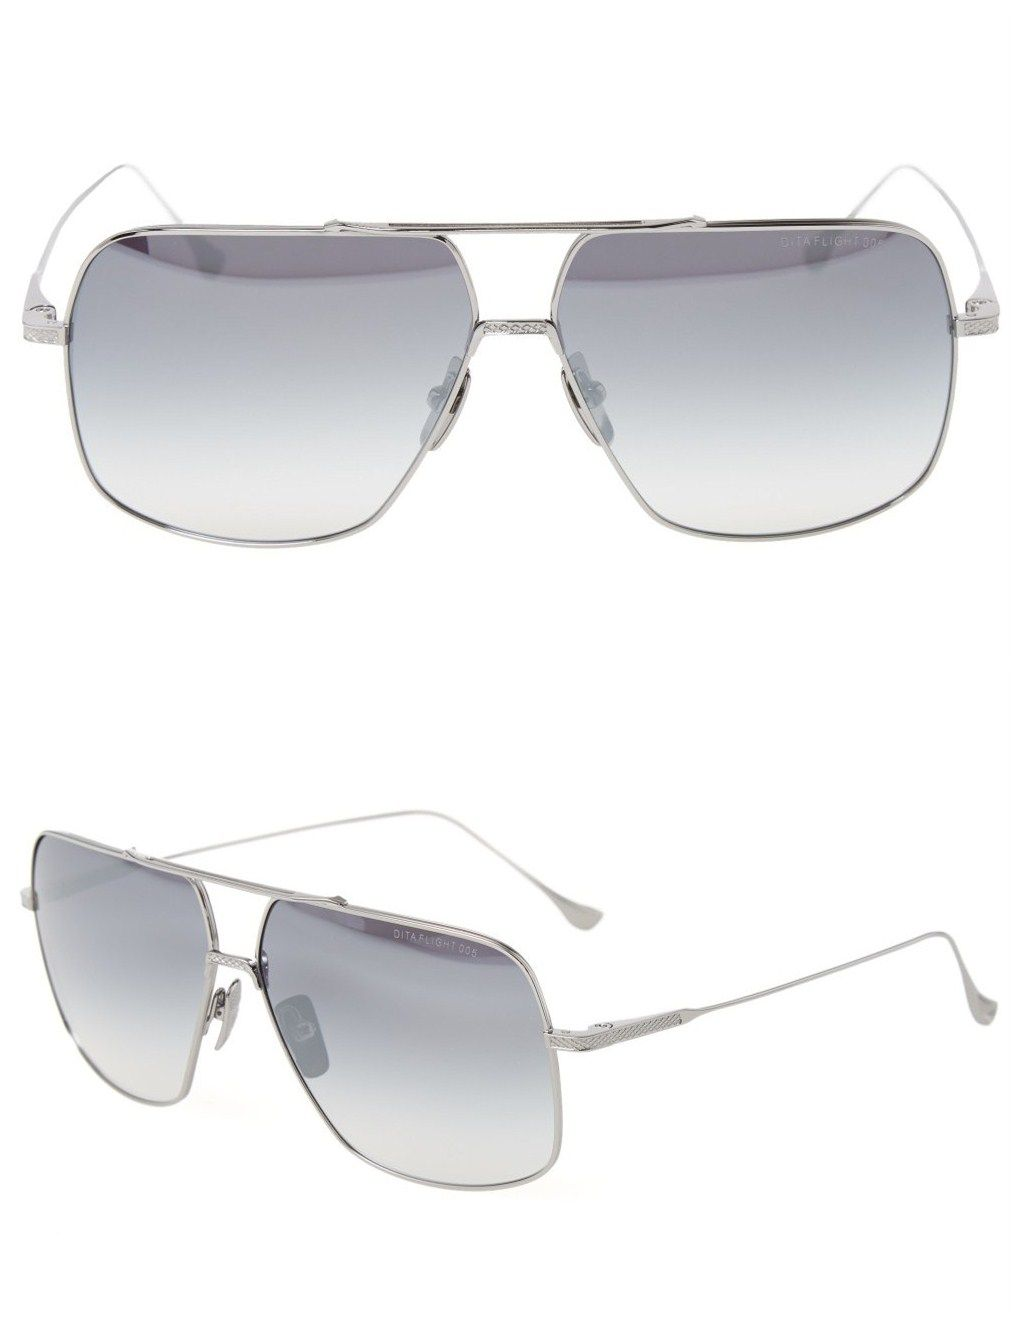 e8d951711c Dita fight.005 men sunglasses Optical Eyewear